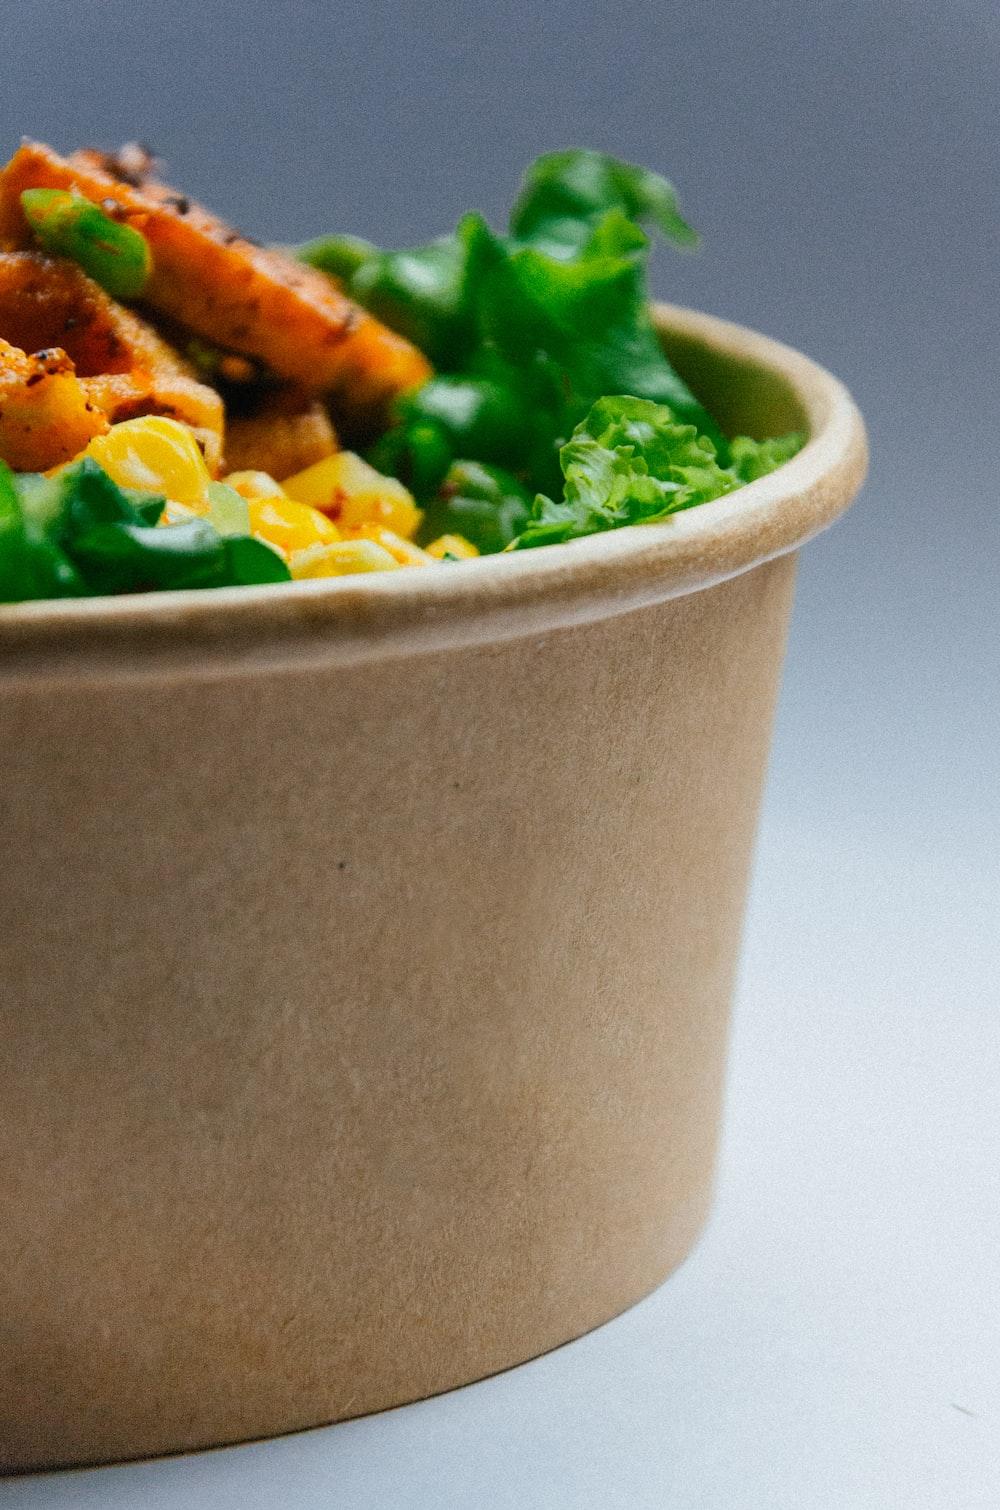 vegetable salad on gray ceramic bowl